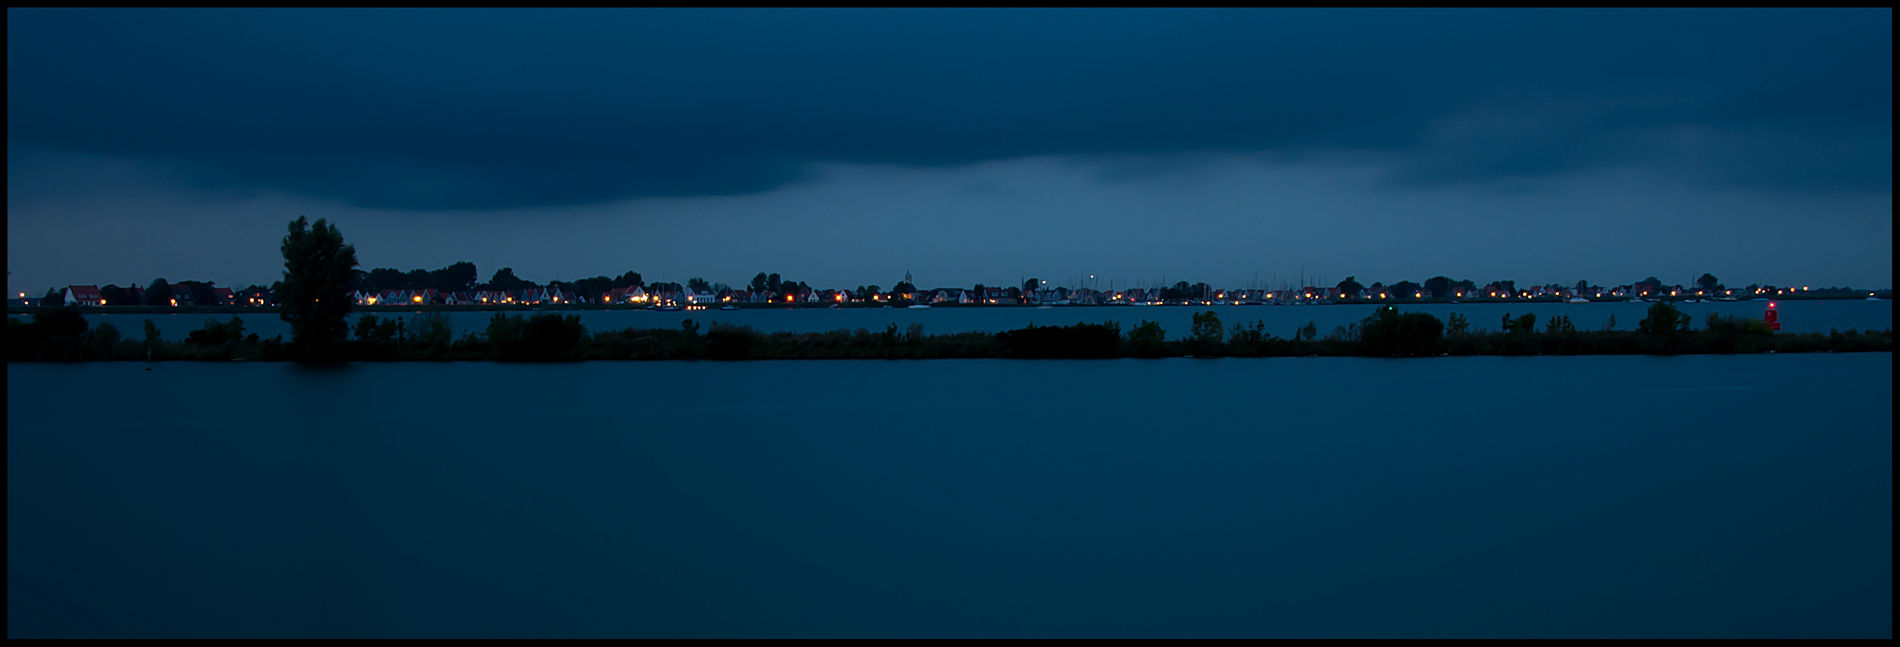 Durgerdam Panorama Village Water Evening Blue Sky Blue Long Exposure Lights